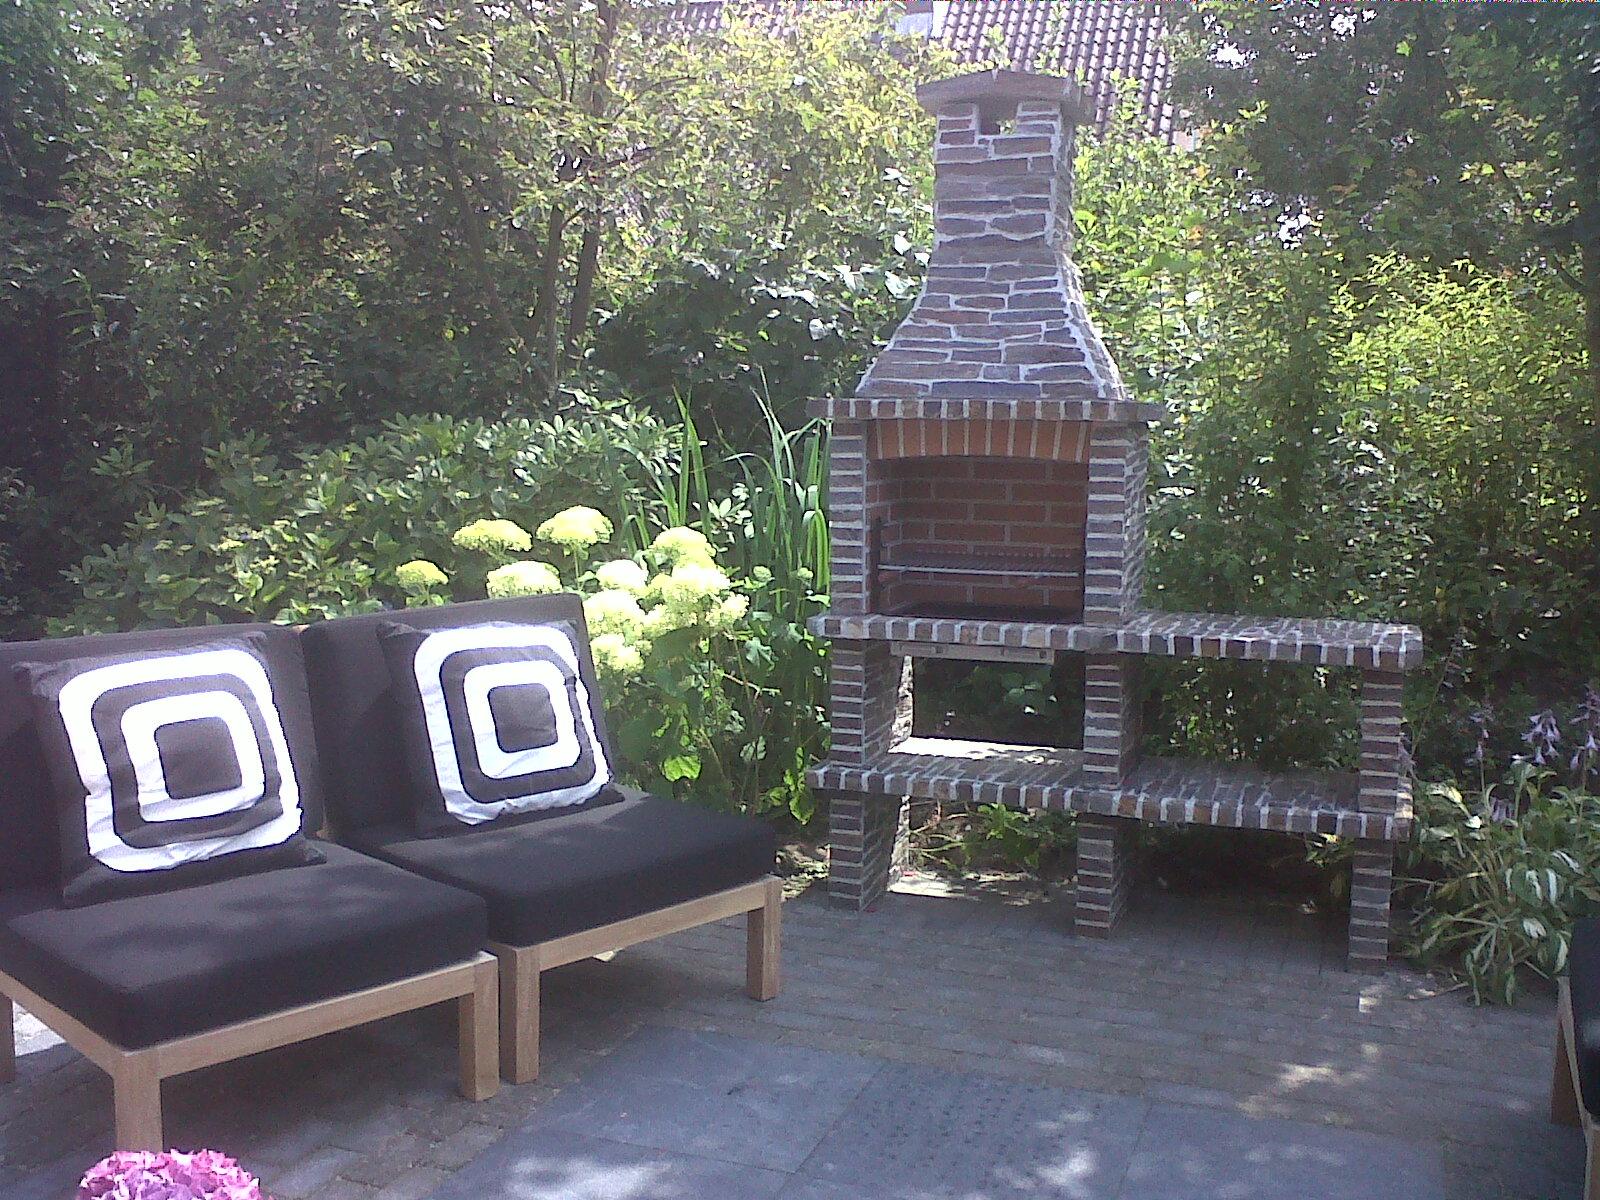 Malaga 34, Natuursteen belegd - steen kleur: Rustiek, inbouw Grillset G3 zwart gelakt. 1 extra verlengblok toegepast.